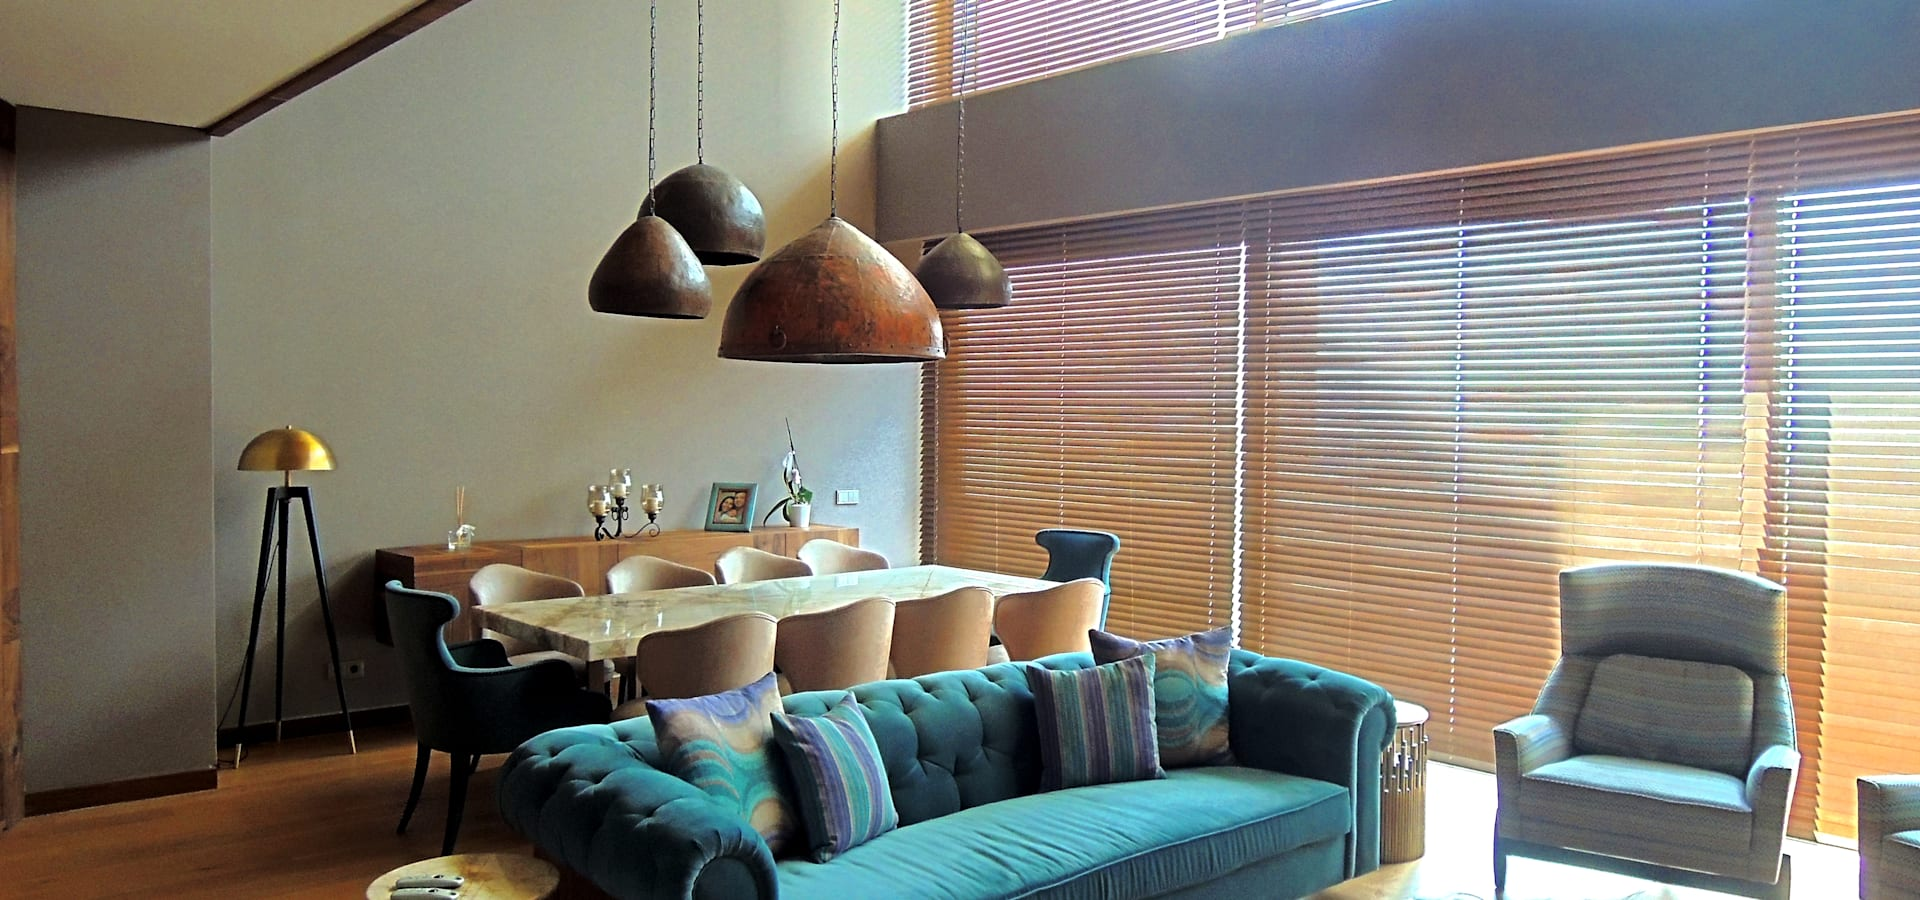 Visage Home Style